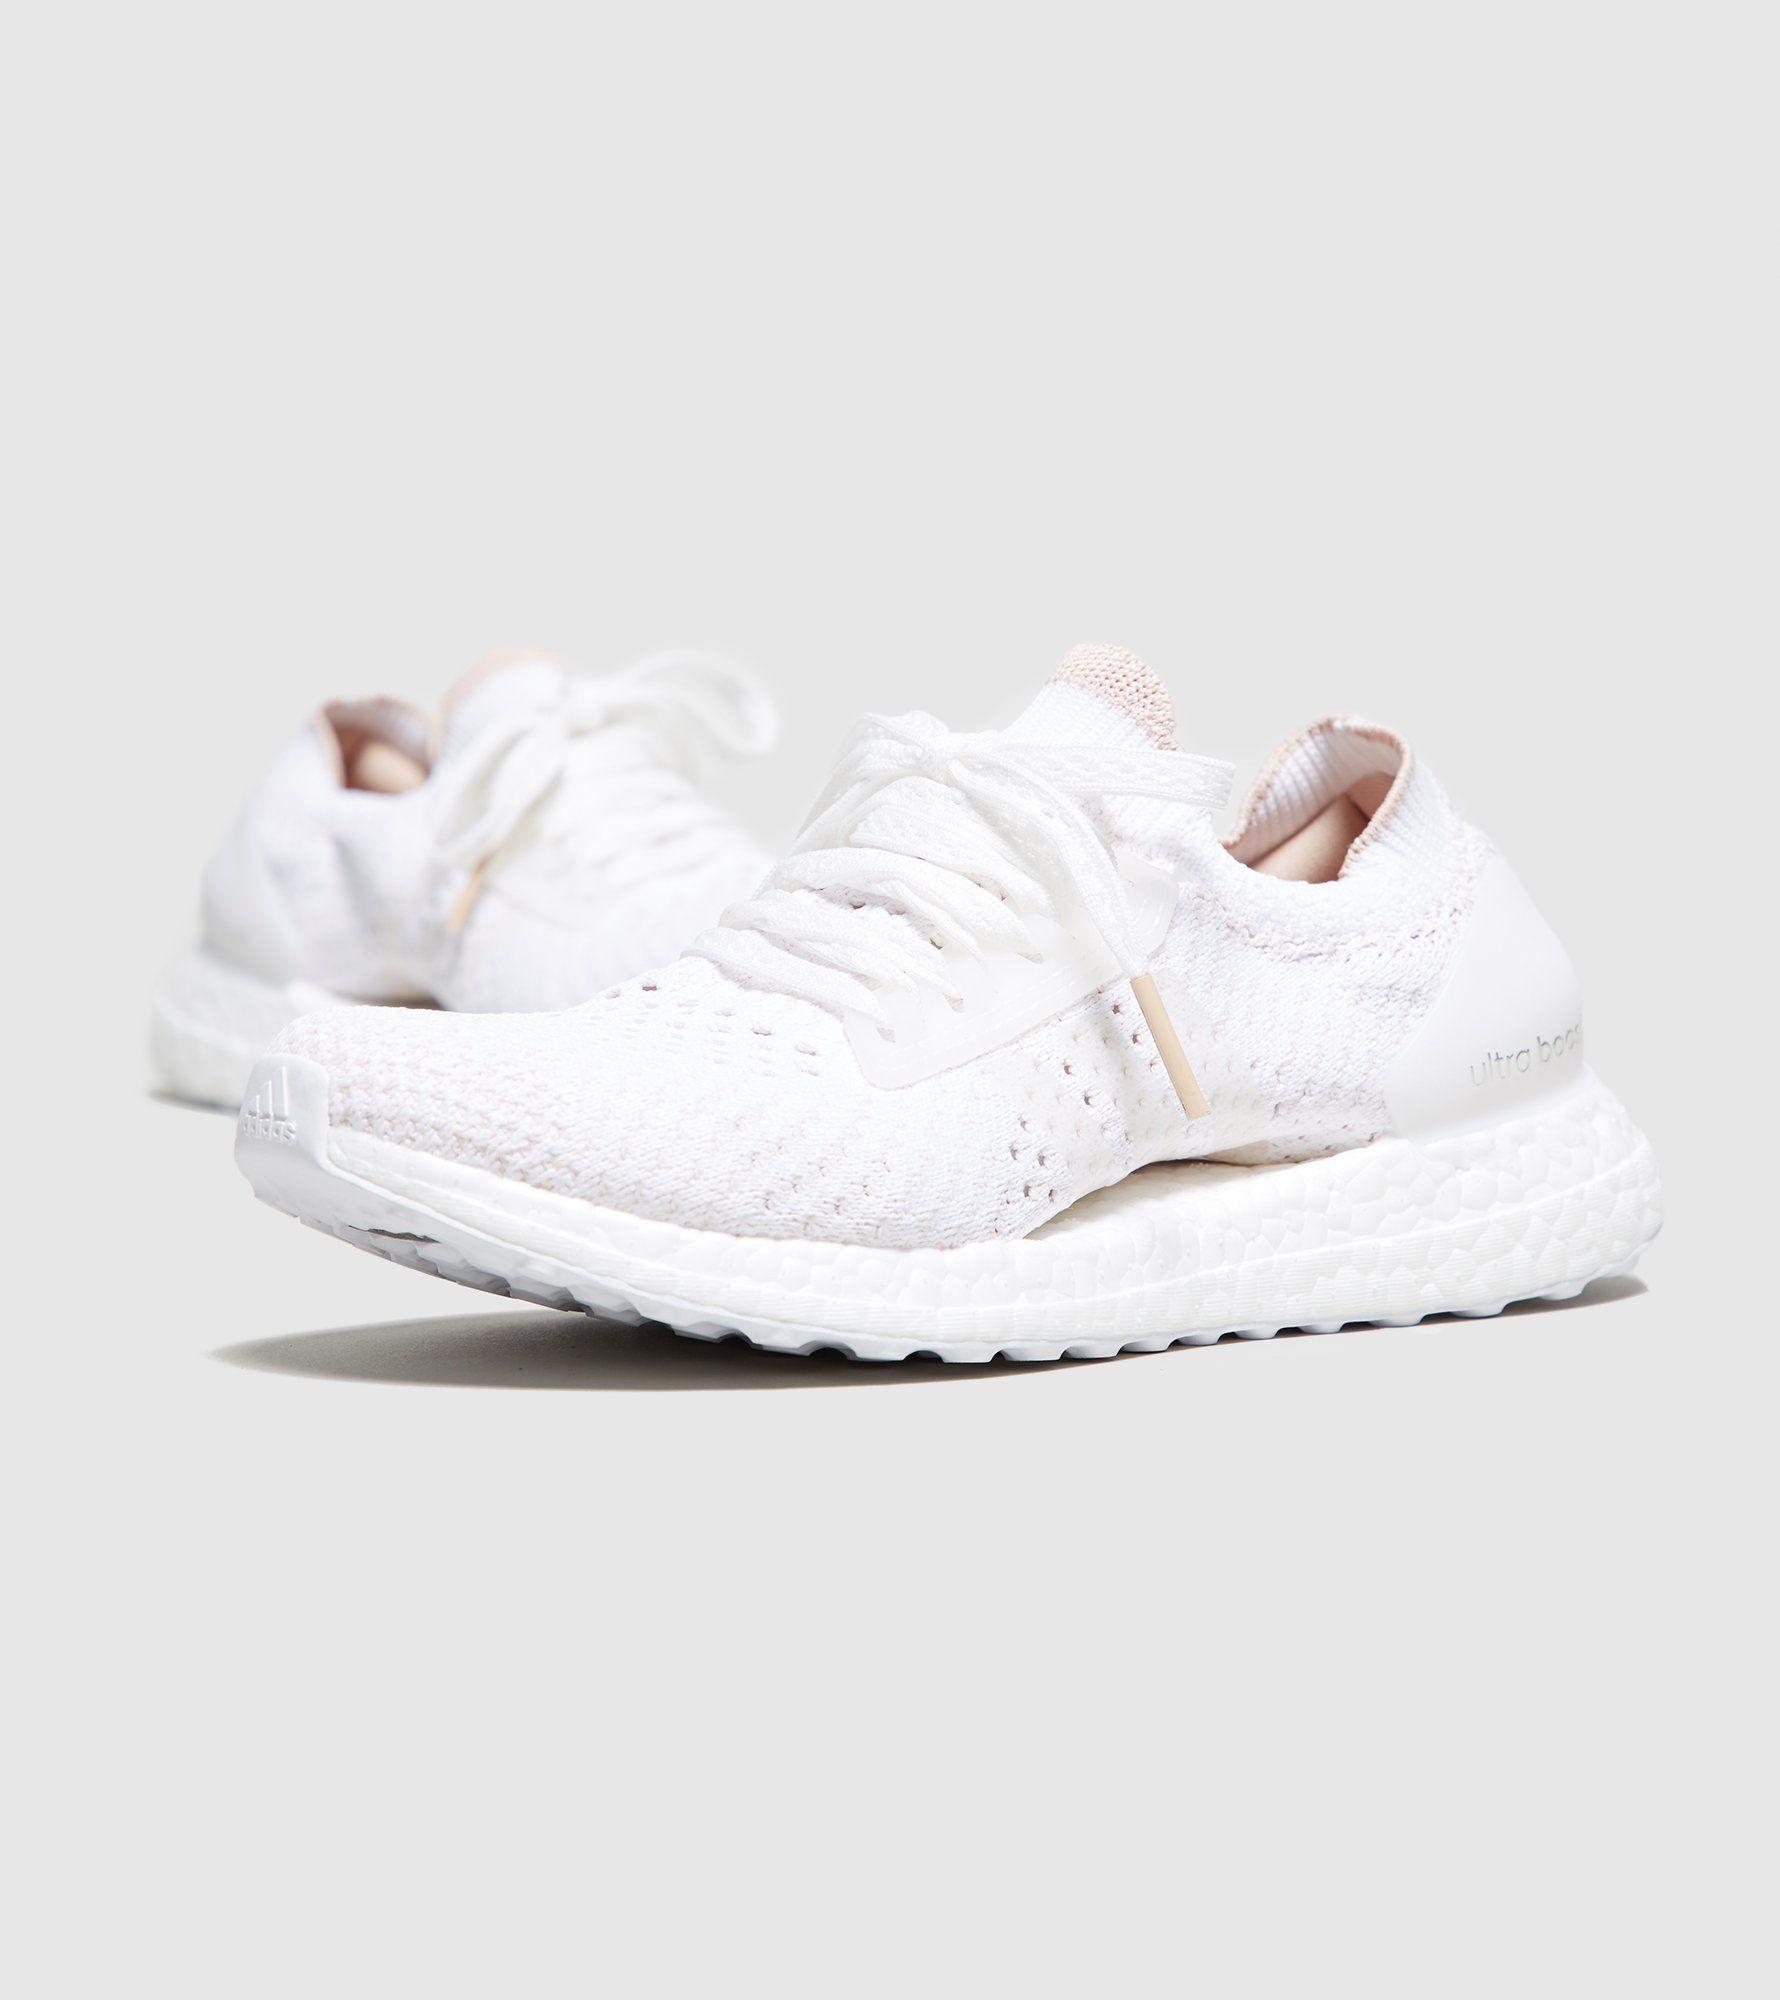 a36672e91d2c2 ... shoes white crystal white ss17 38494 cf6a1 discount adidas ultra boost  x clima womens 11ba1 1b3ee